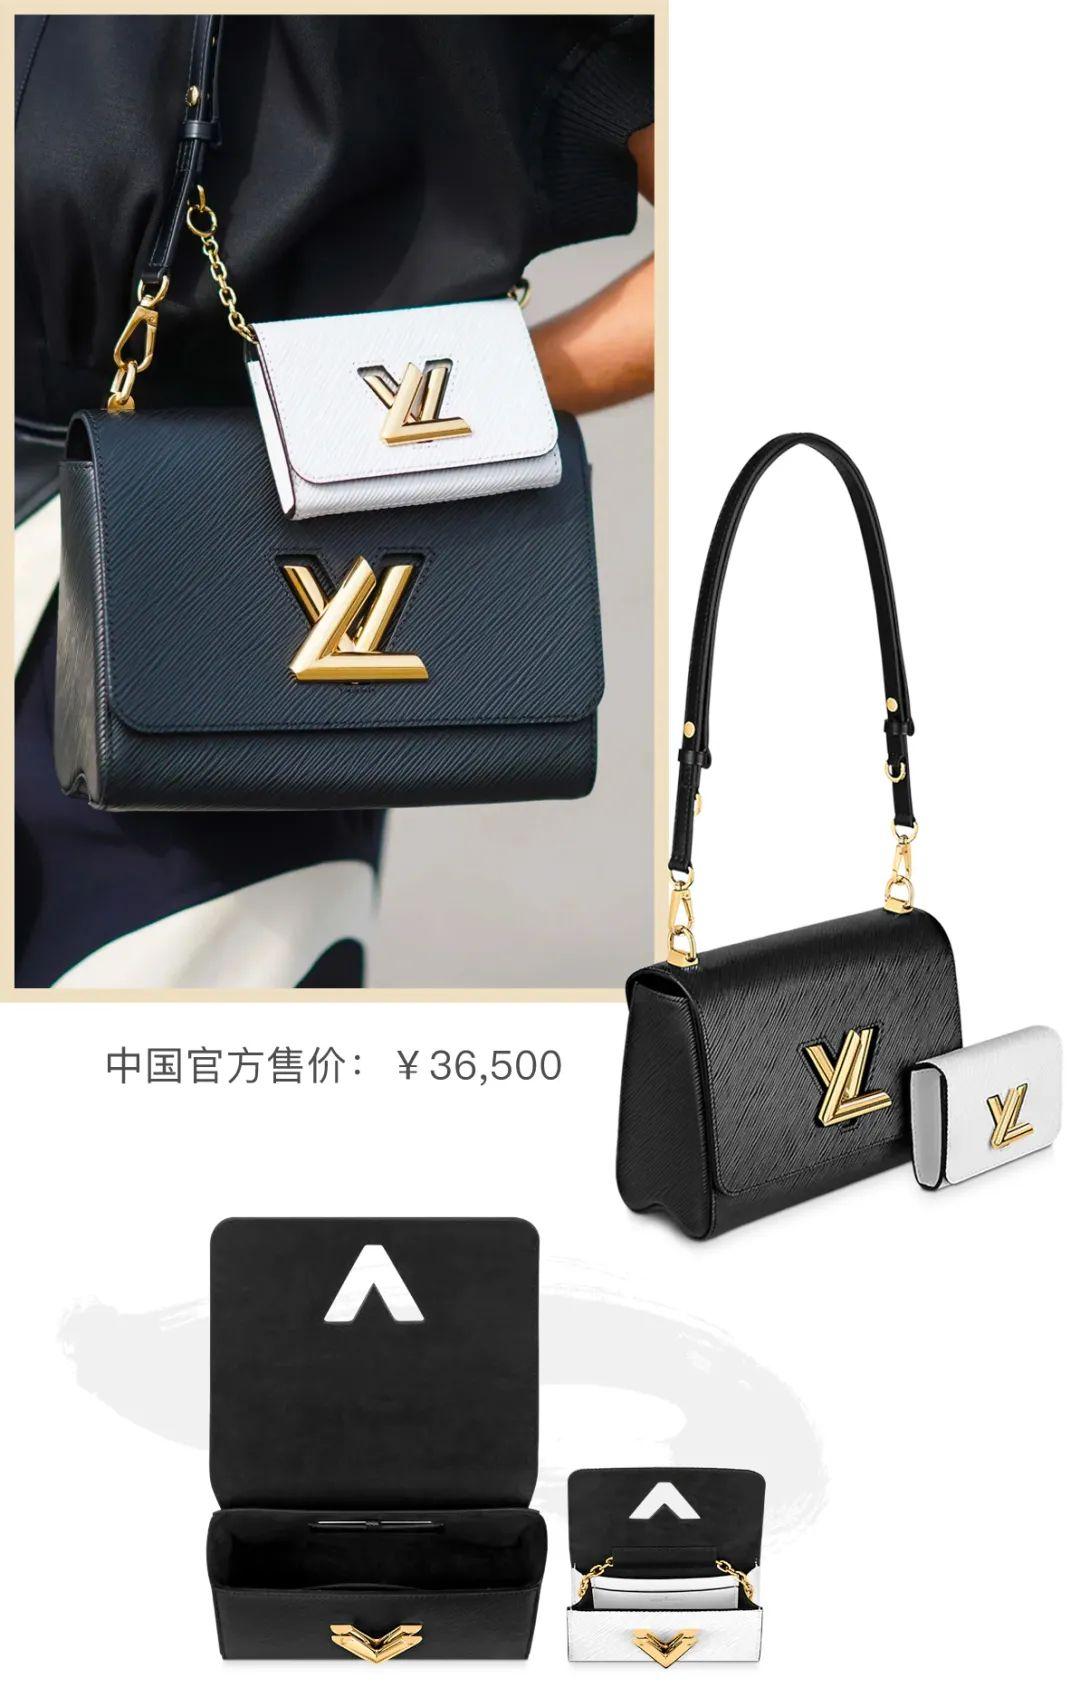 LV、Chanel包买一送一,大牌们咋内卷成这样了?